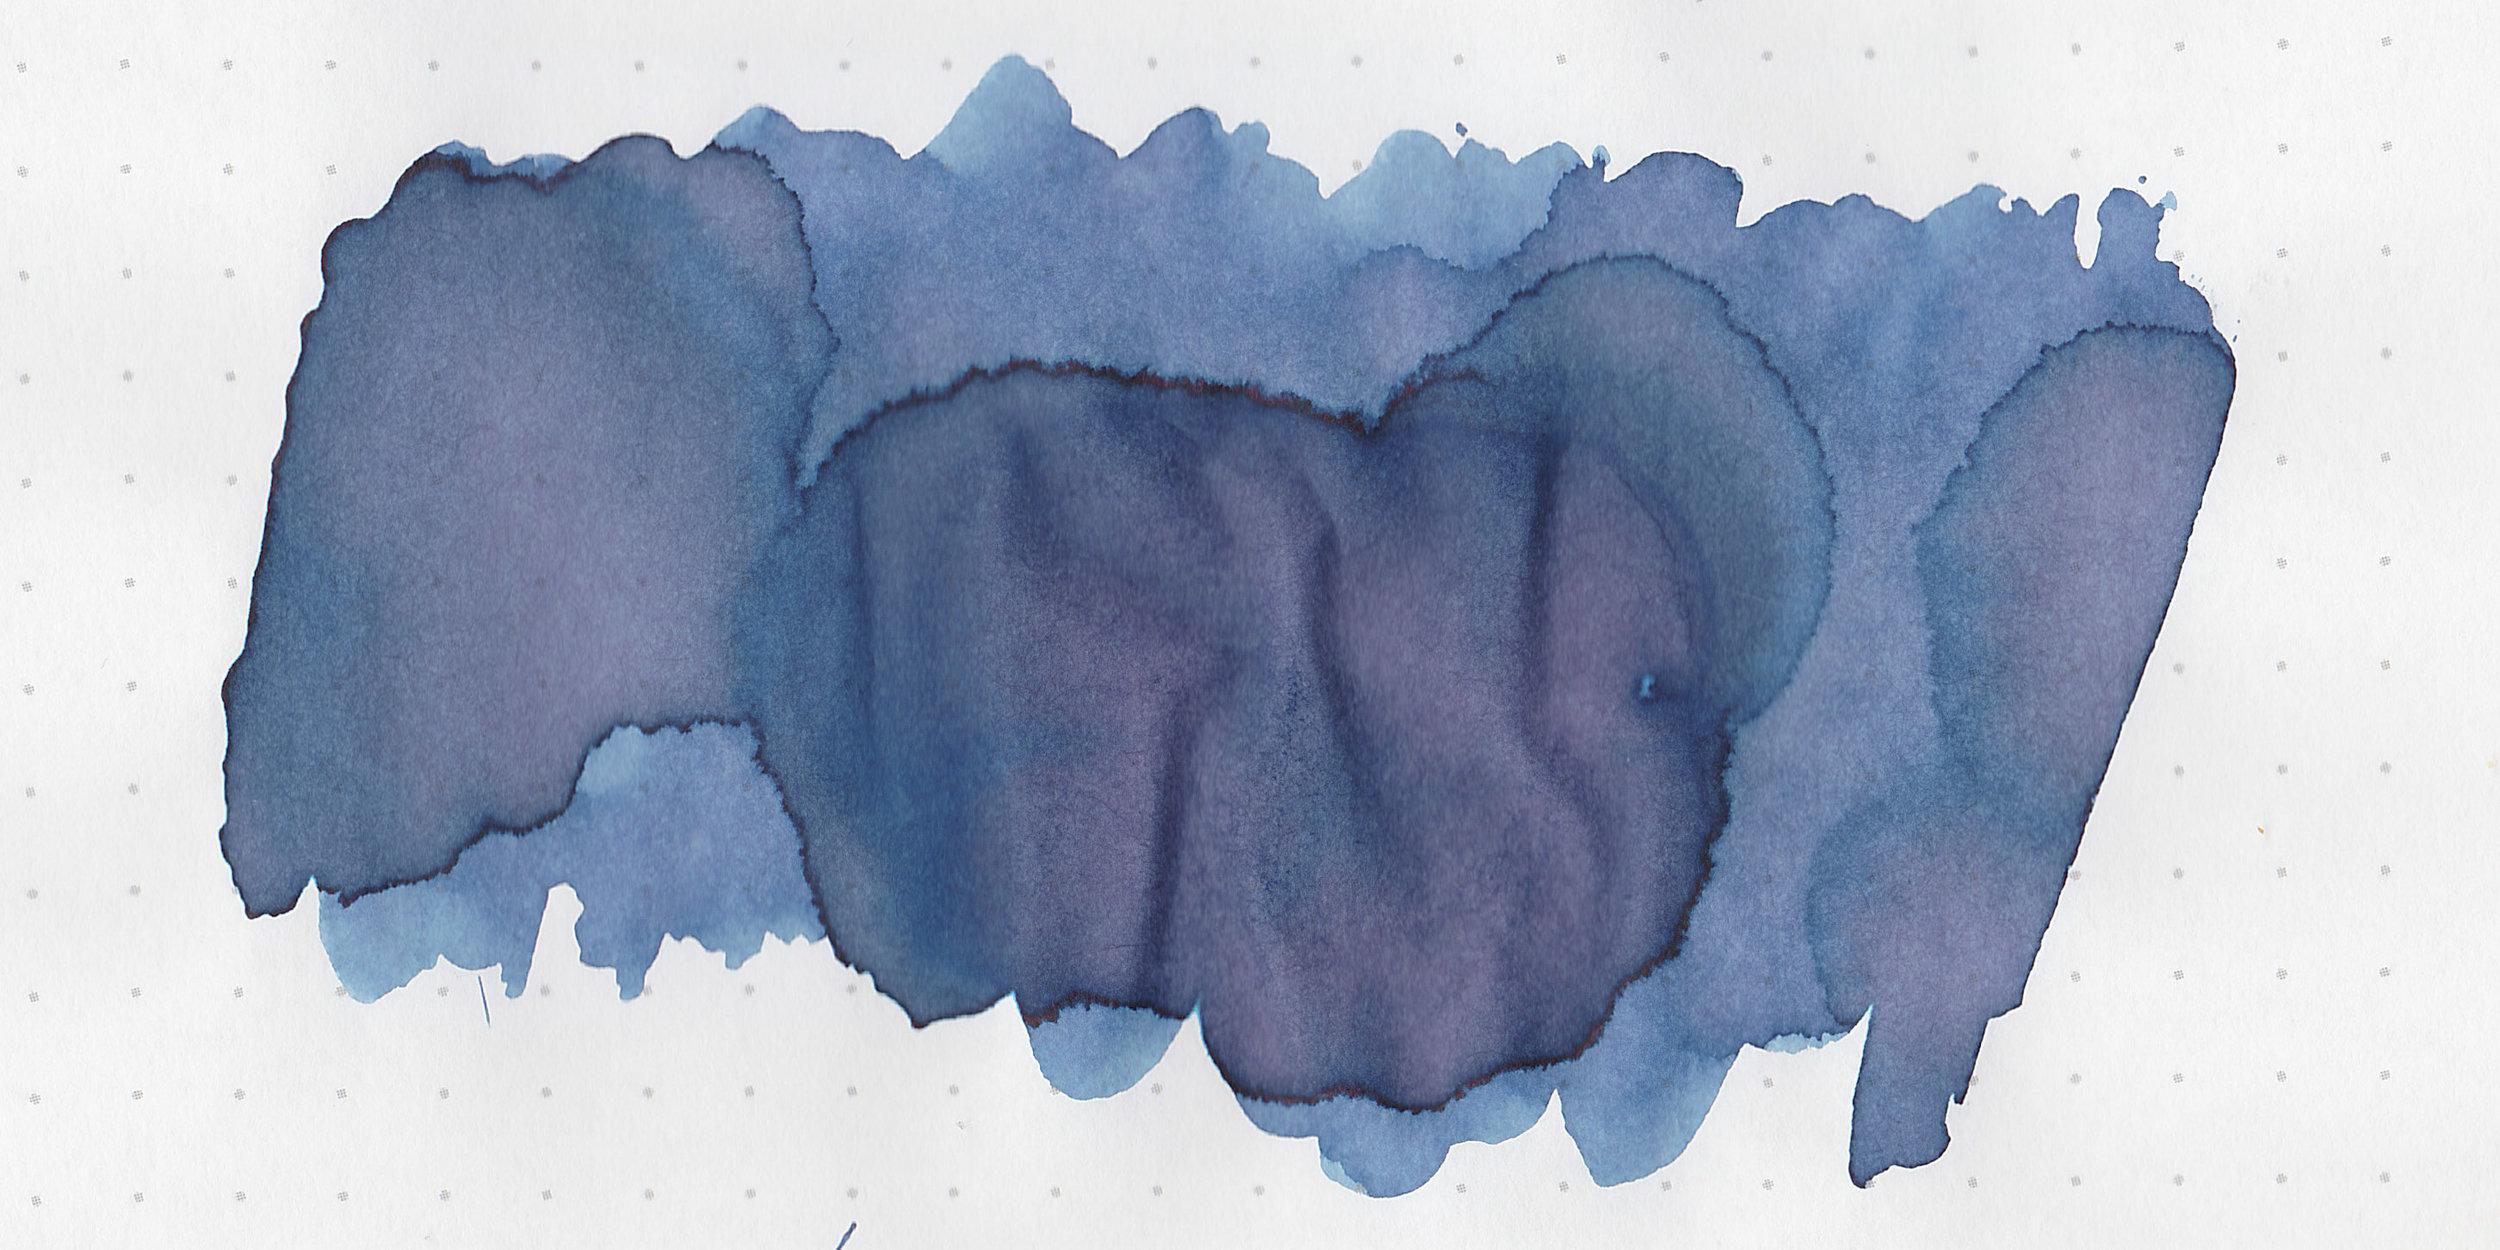 ro-grey-seas-12.jpg